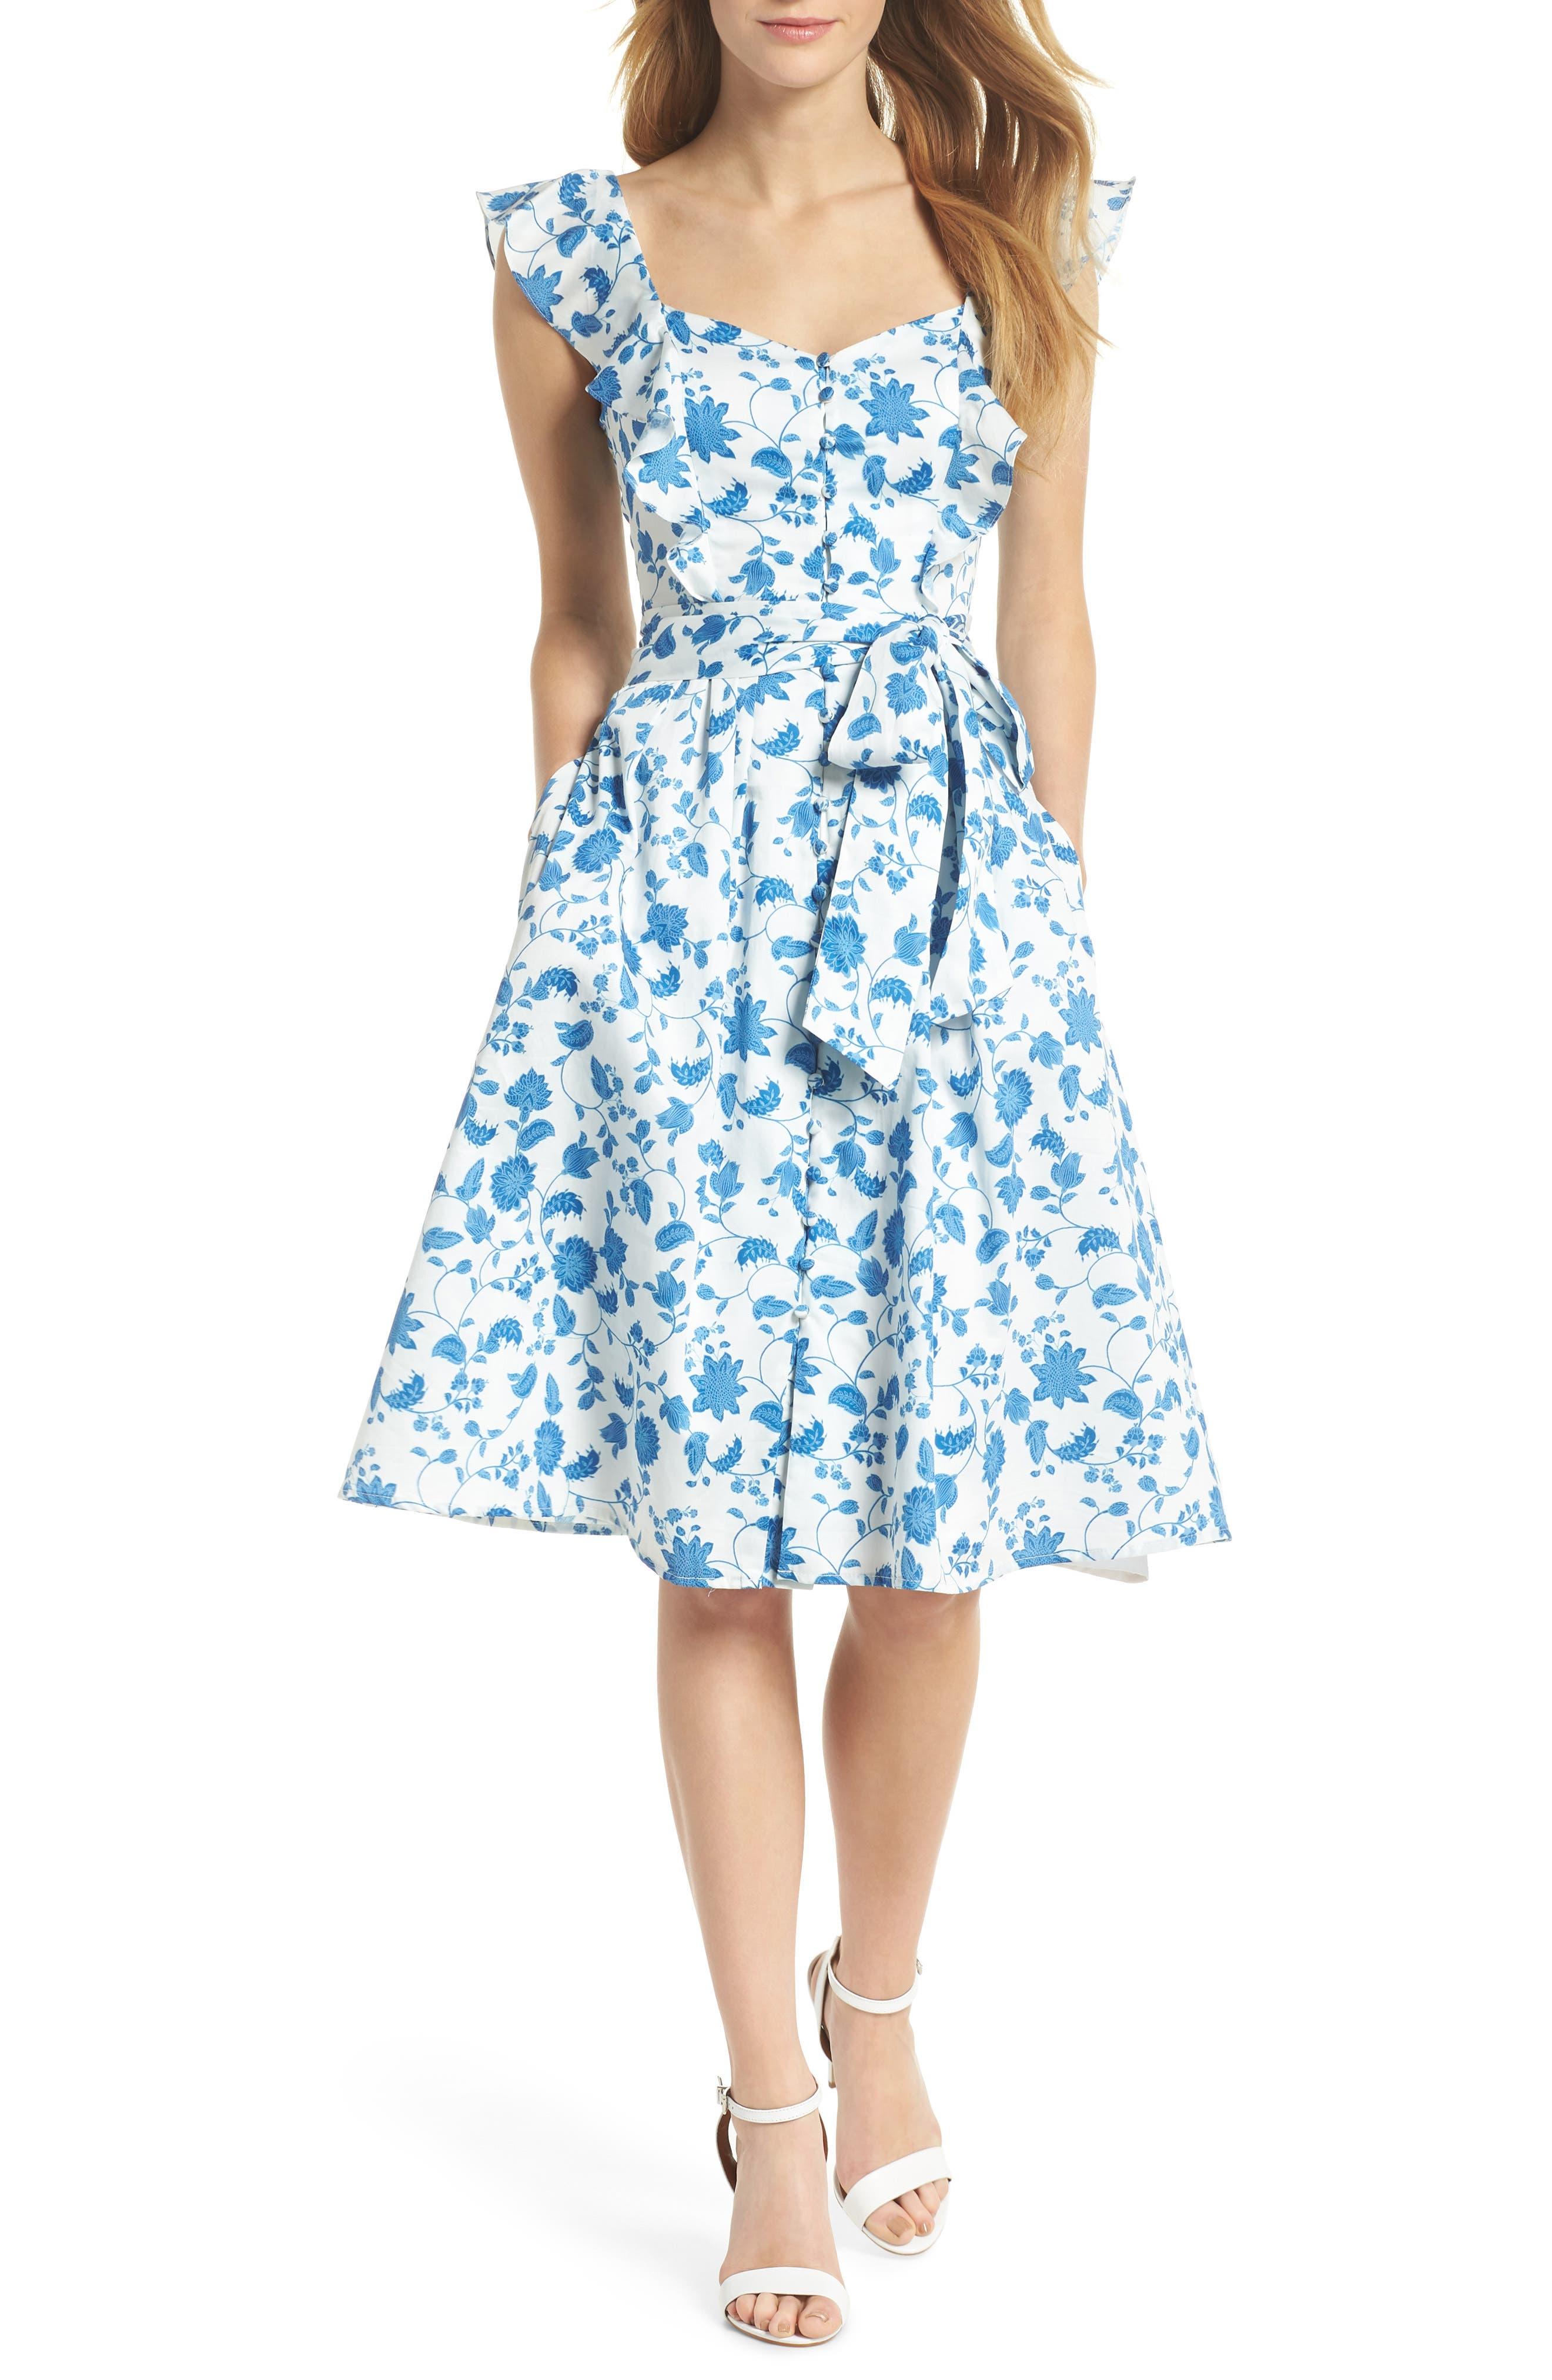 Olivia Floral Wallpaper Print Fit & Flare Dress,                             Main thumbnail 1, color,                             Cloud/ Blue